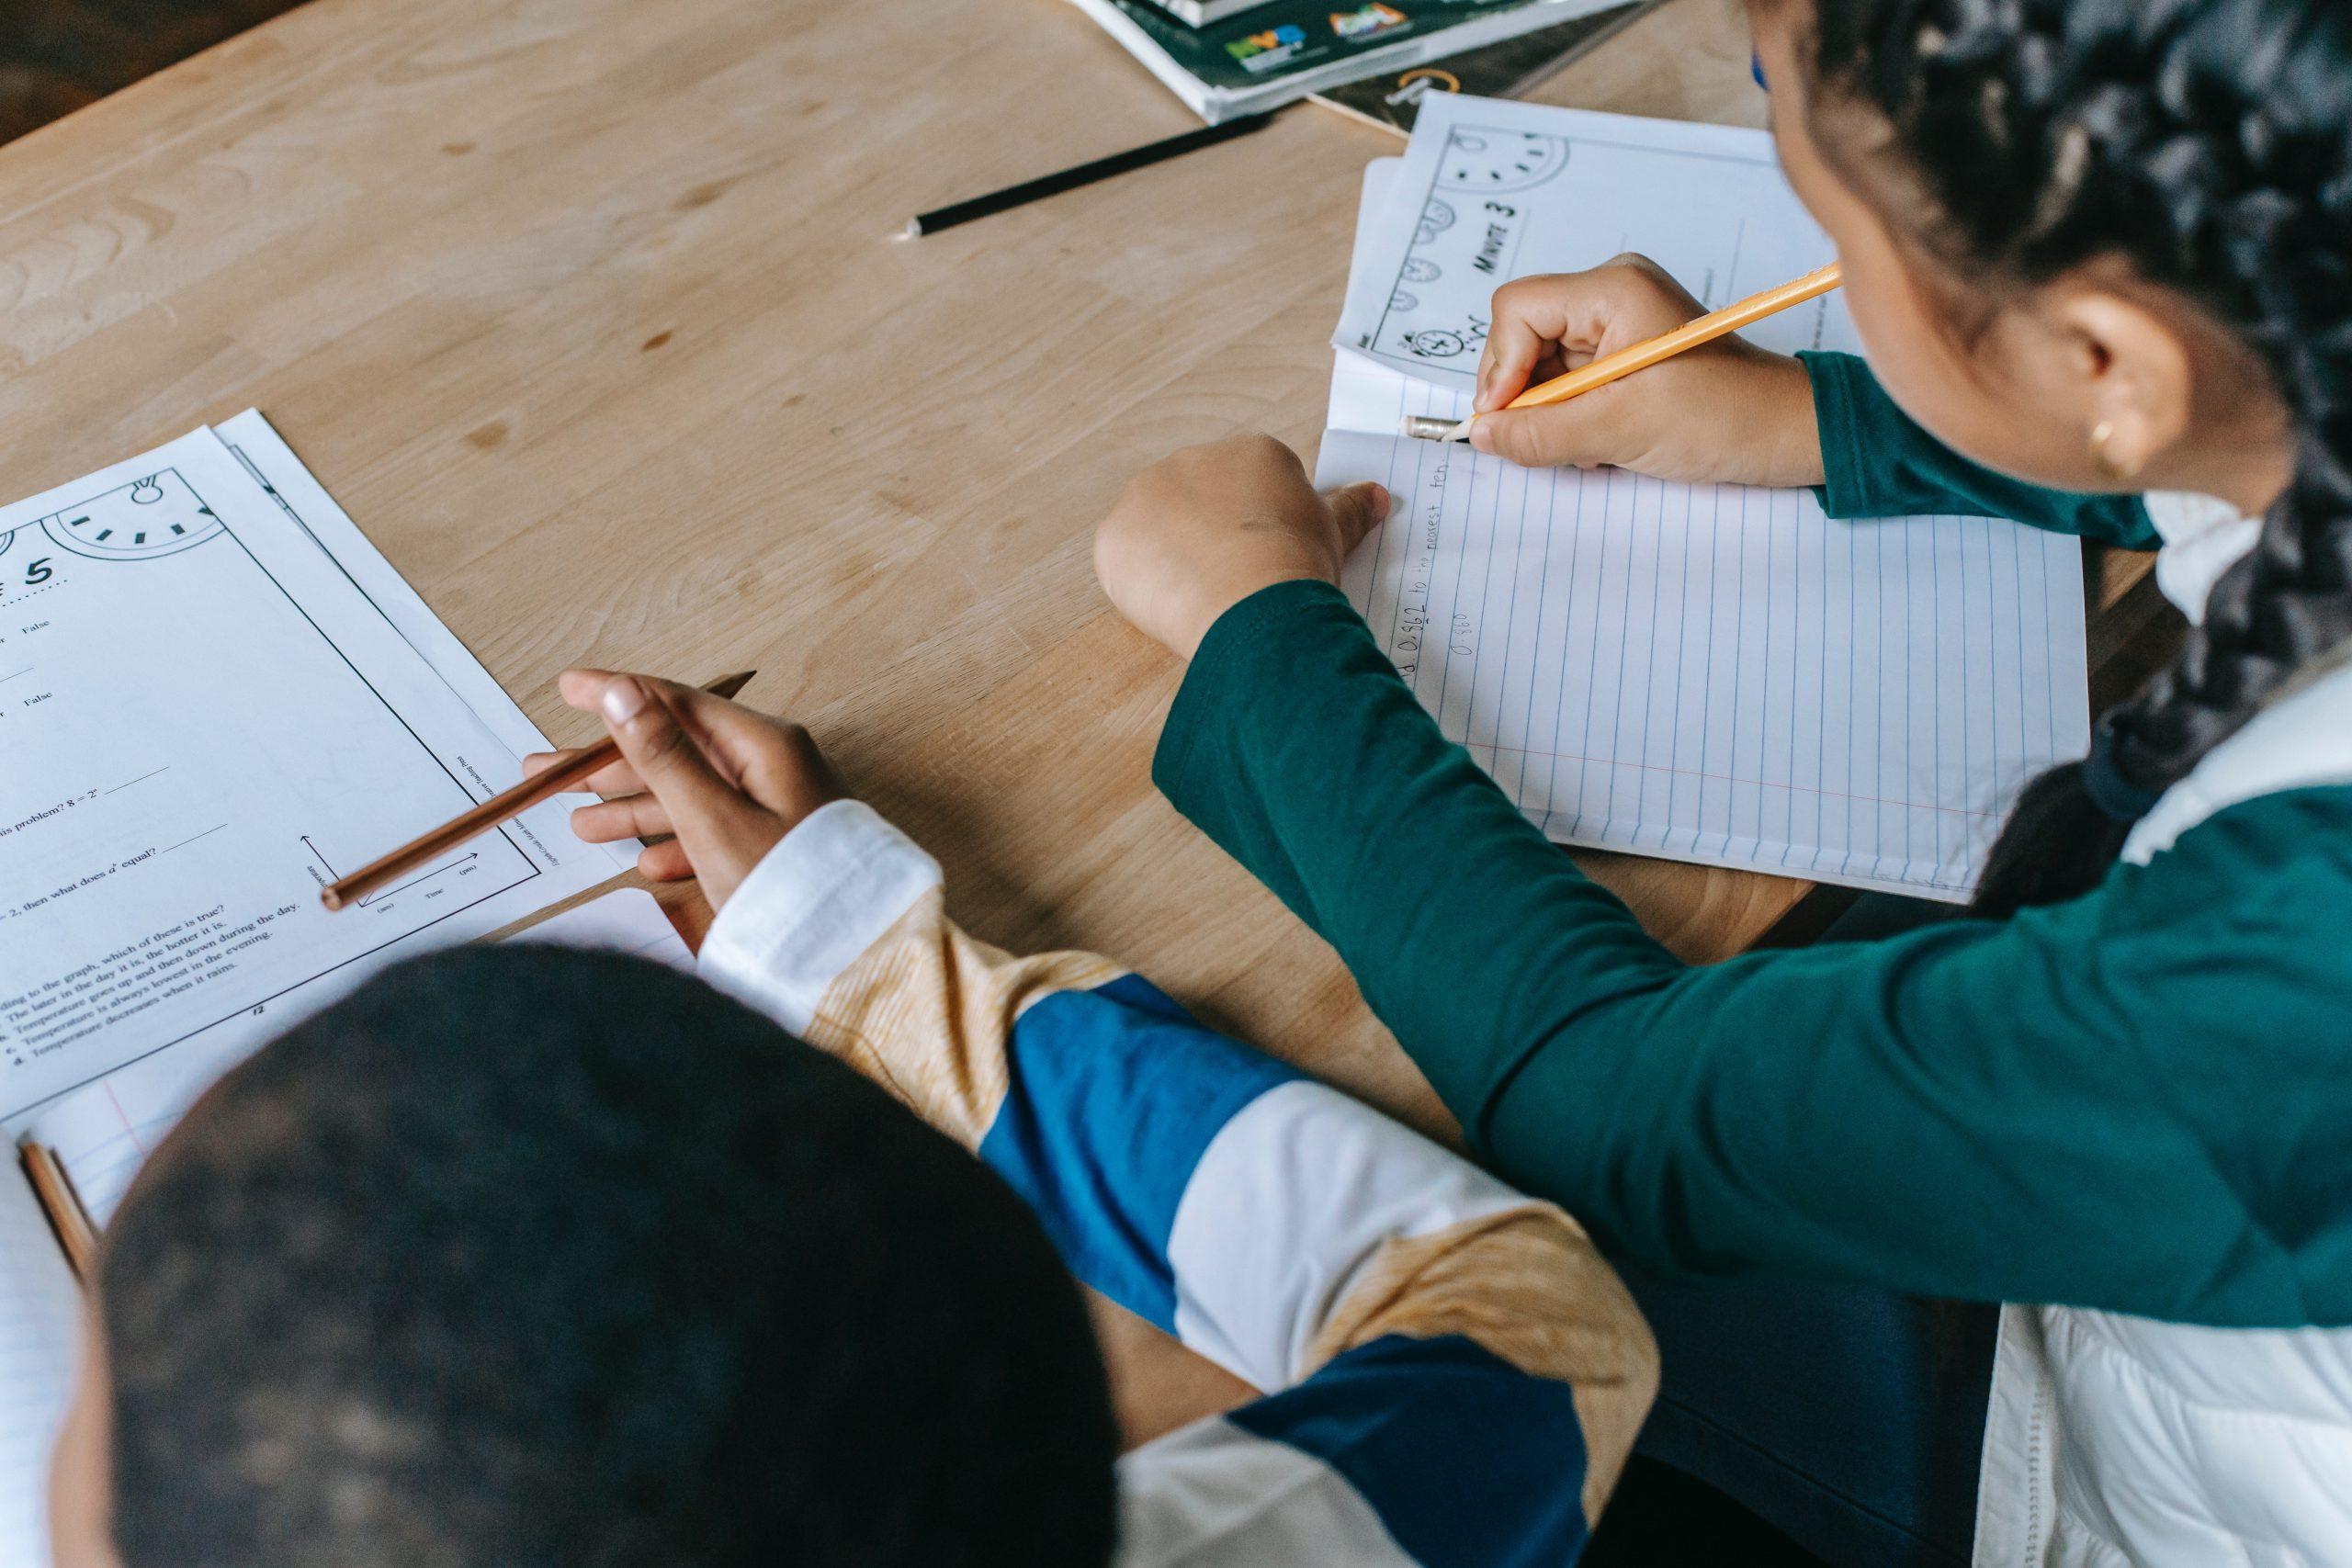 La pandemia dejó en evidencia al sistema educativo